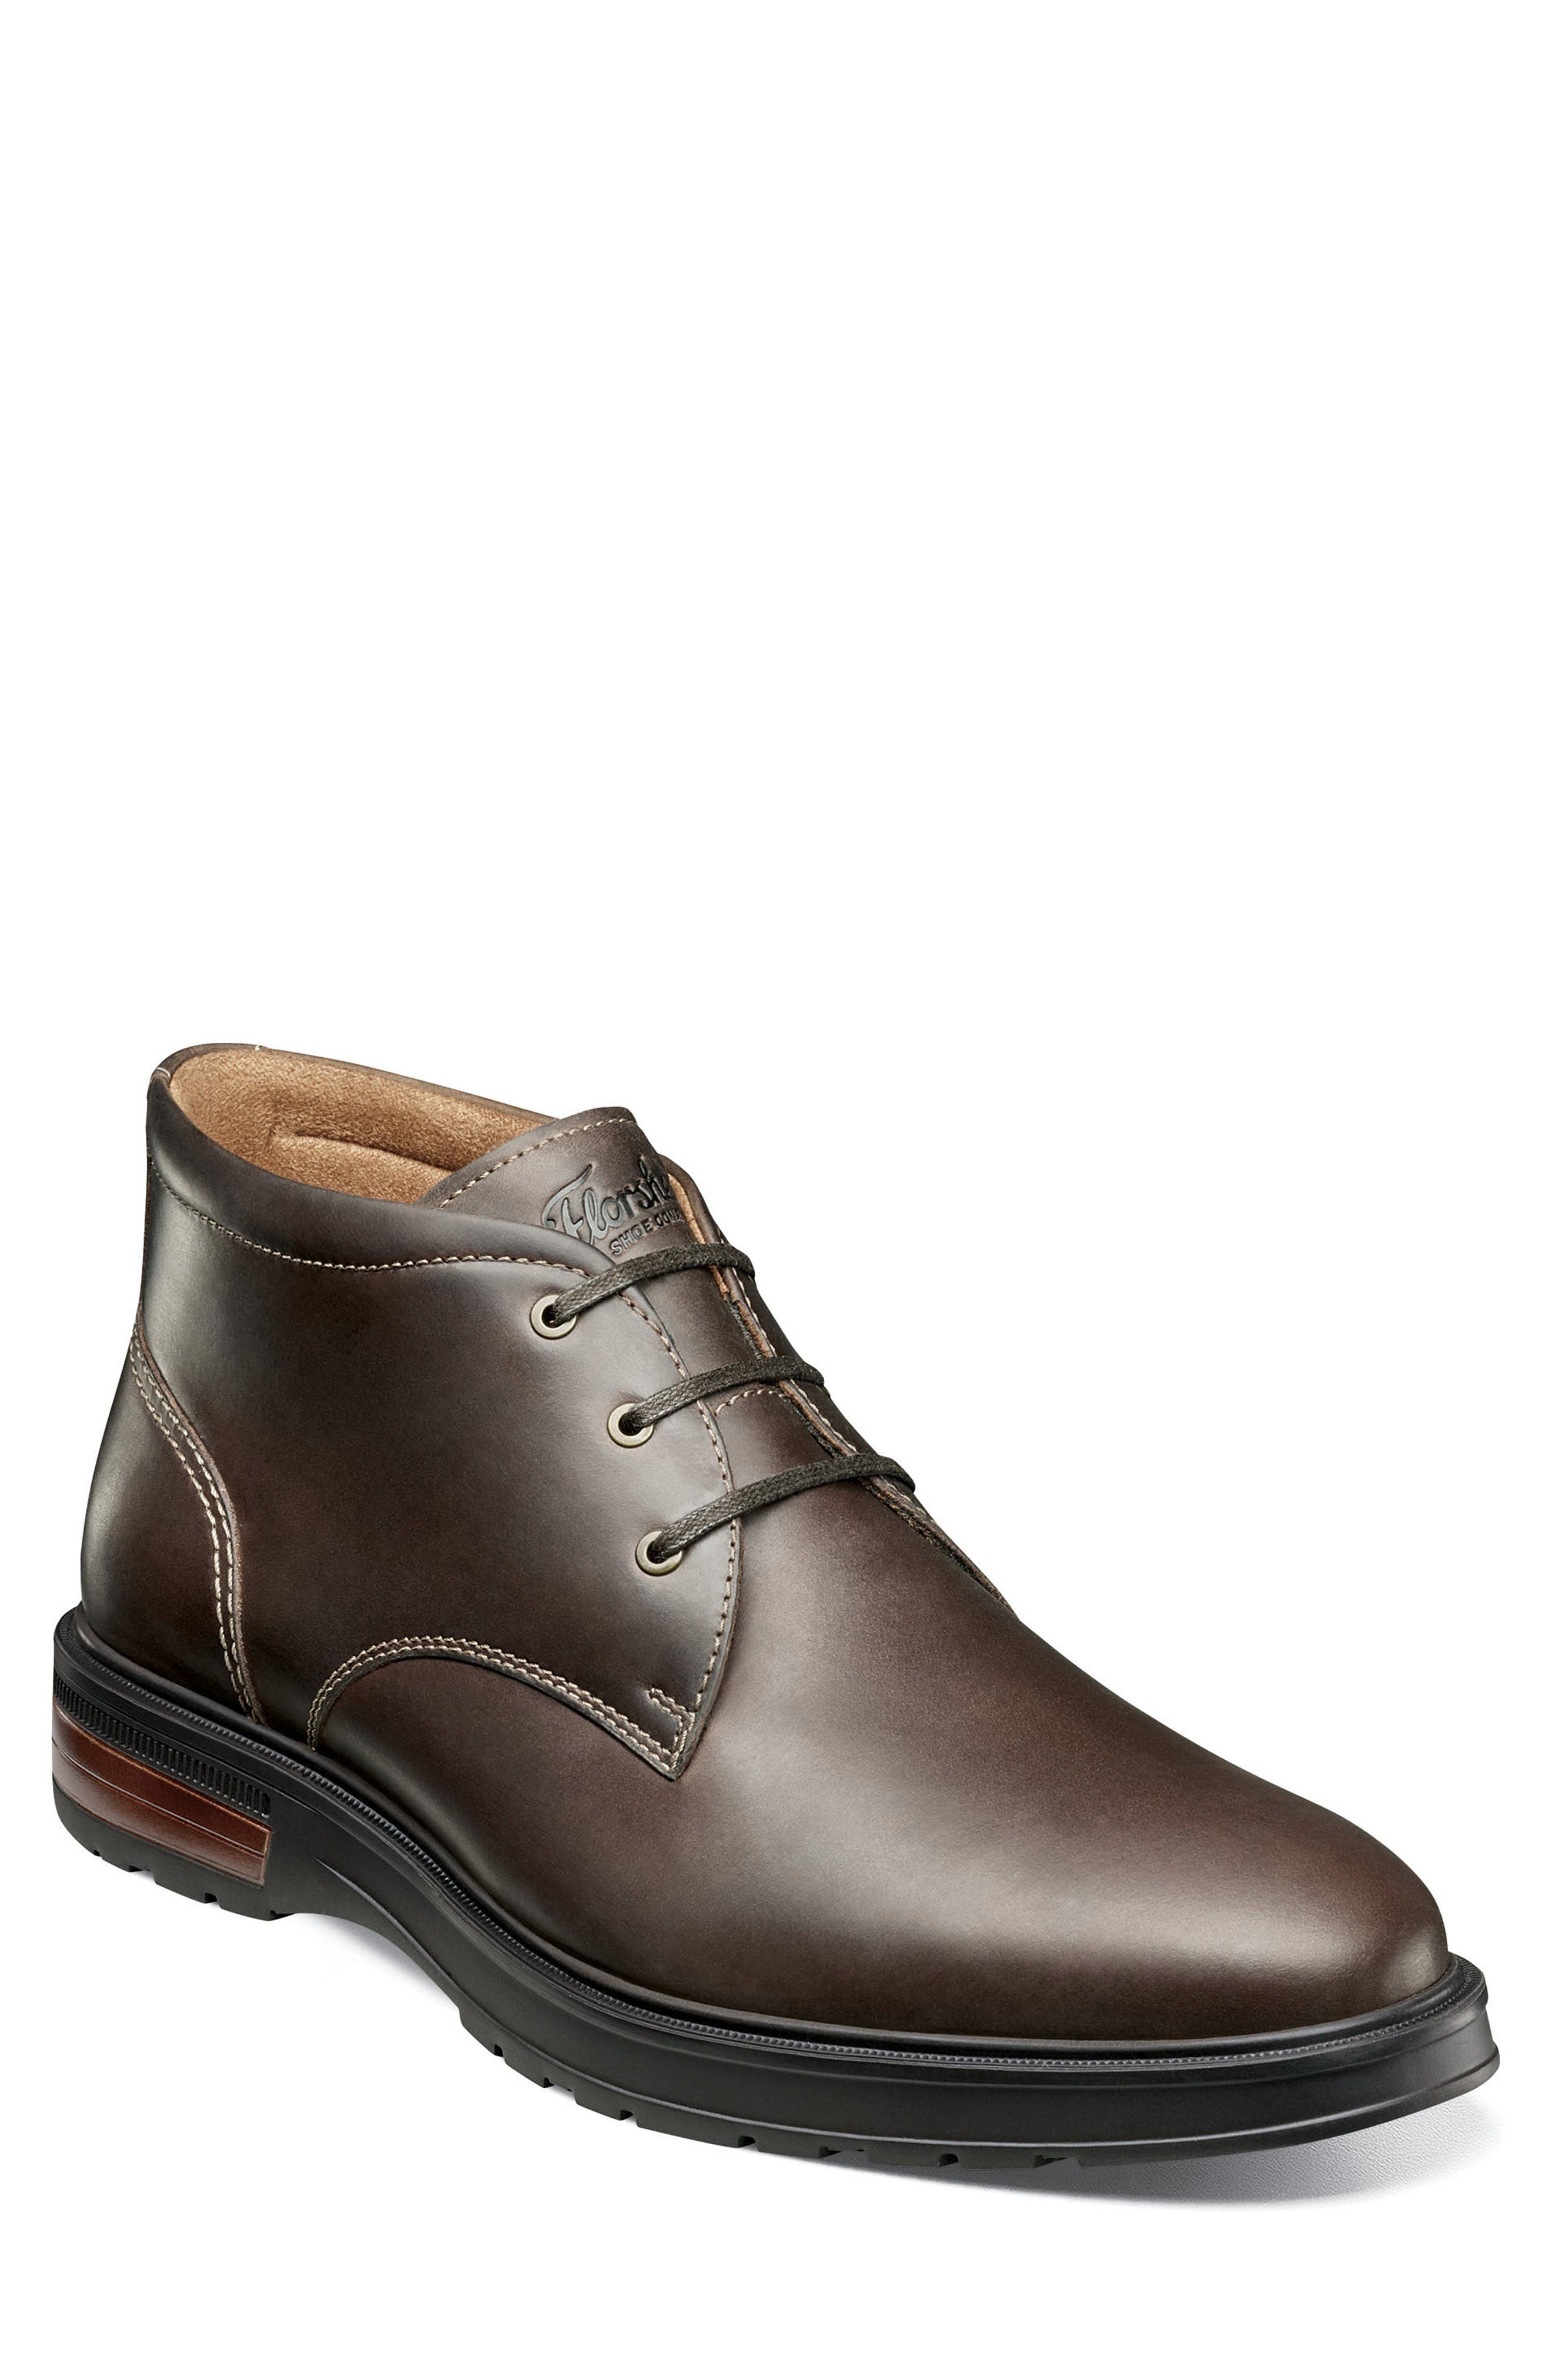 Image of Florsheim Astor Plain Toe Chukka Boot - Wide Width Available